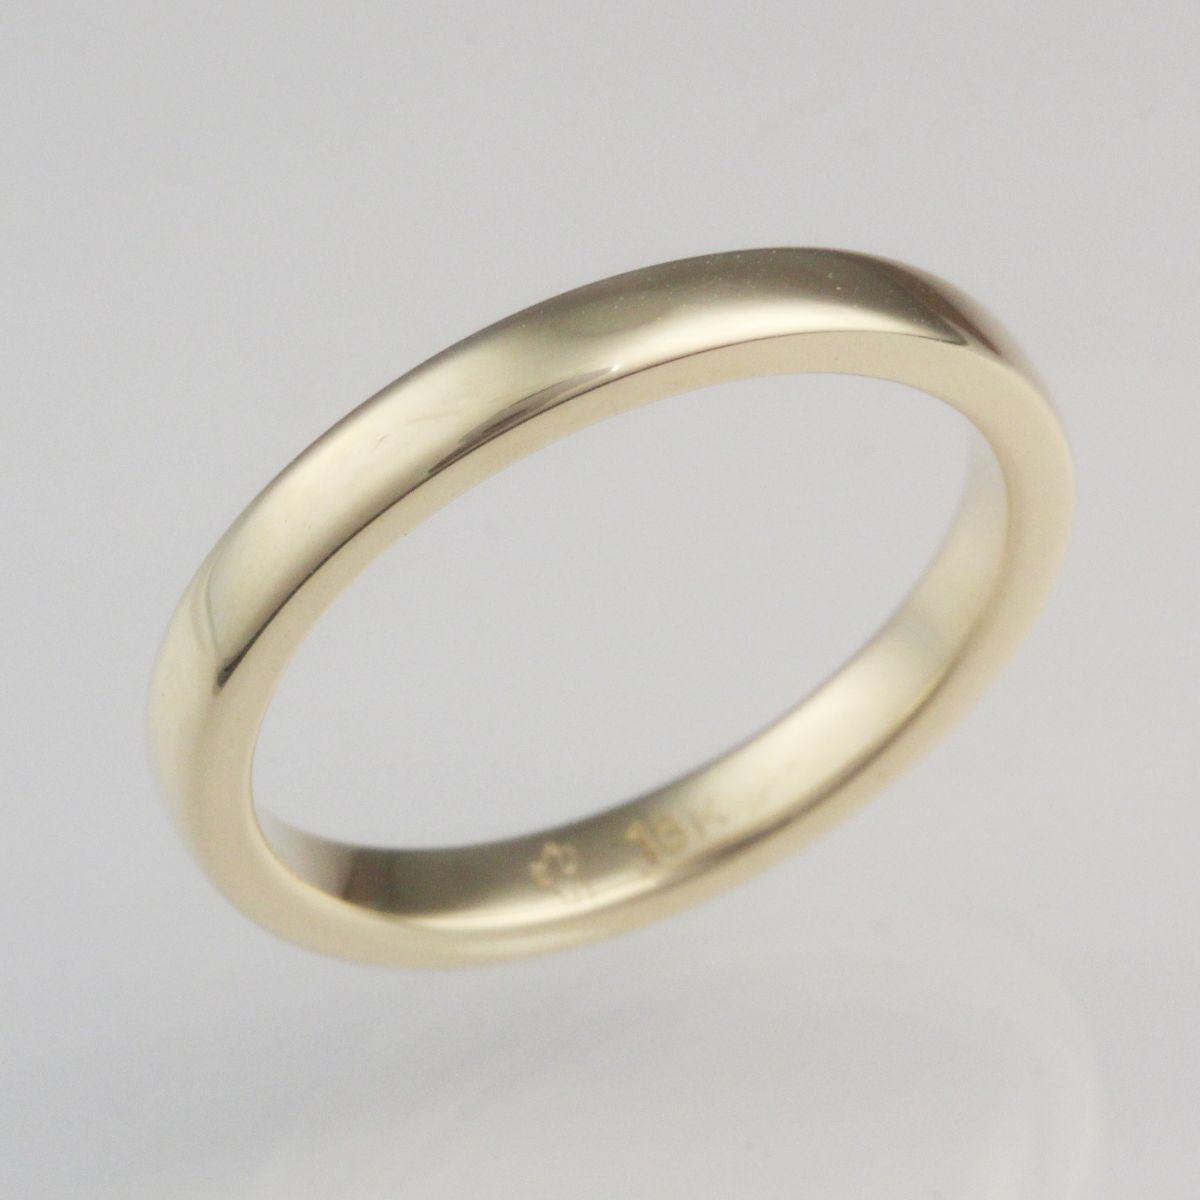 redneck unique wedding rings for him guys wedding rings Unique wedding rings for him